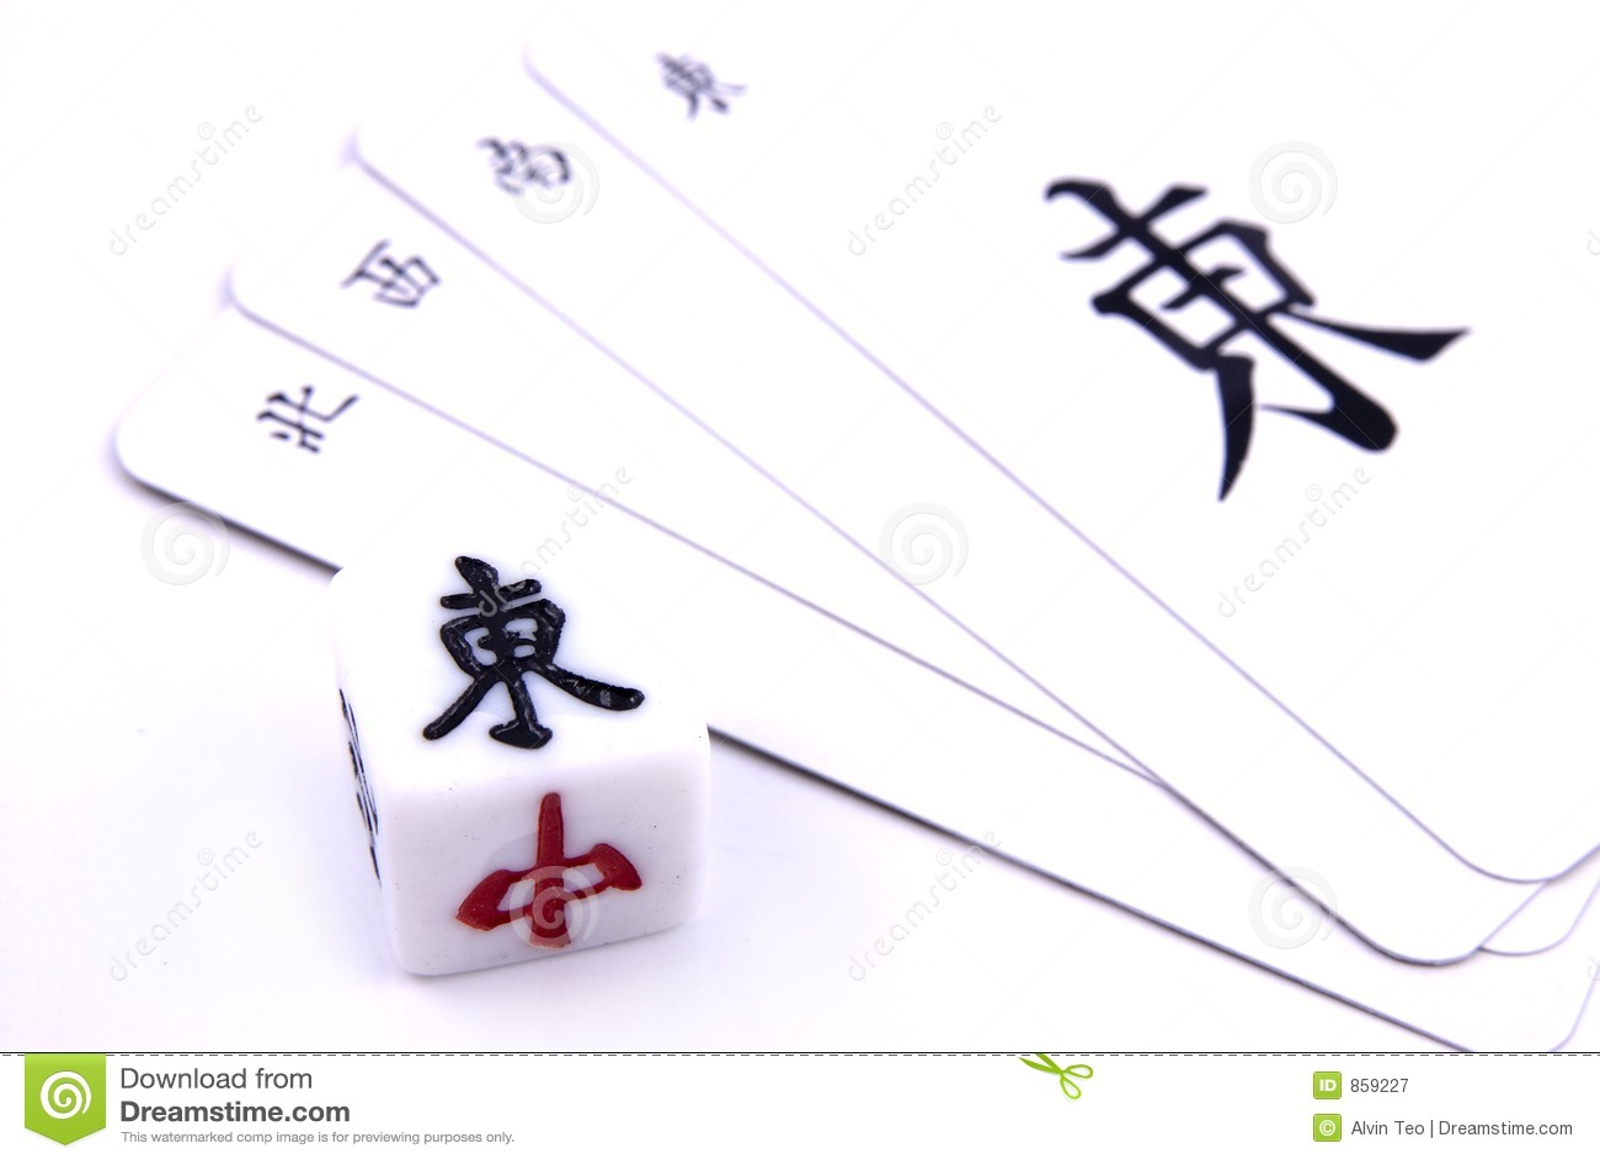 Chinesisches Mahjong Spiel